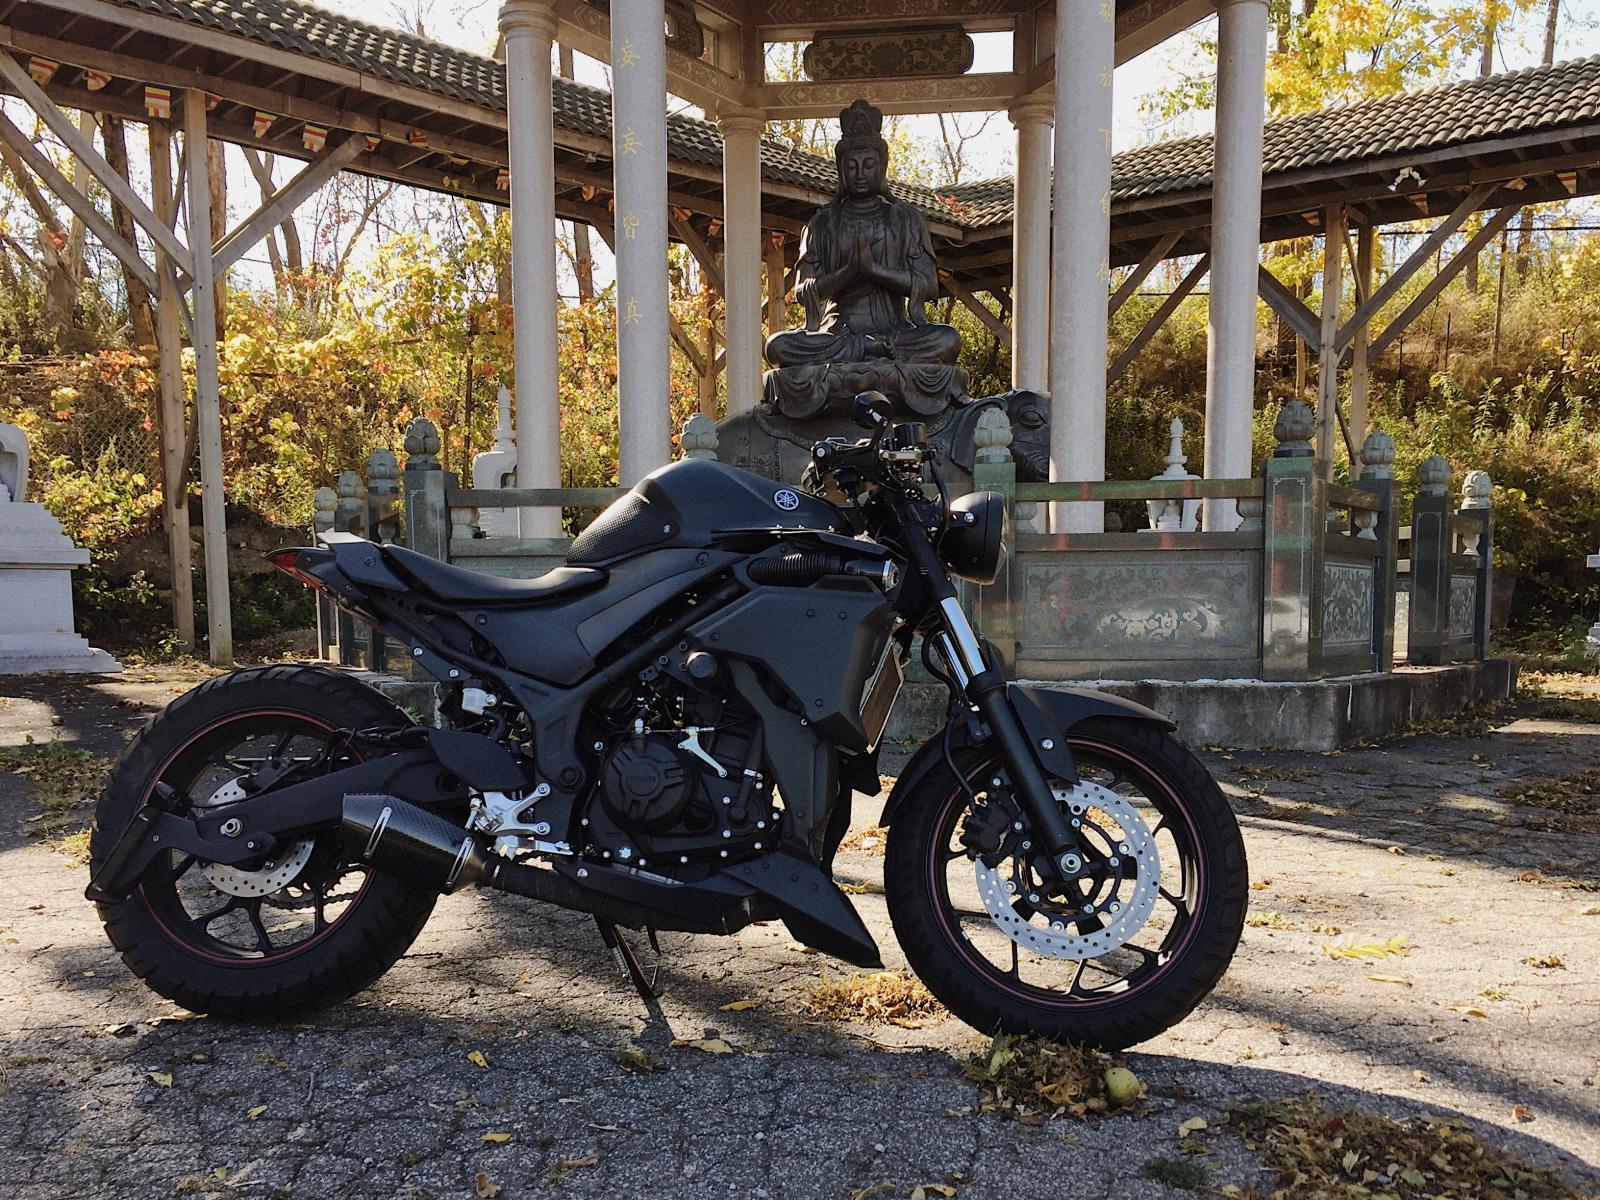 My R3 (Street fighter) - Yamaha R3 Forum